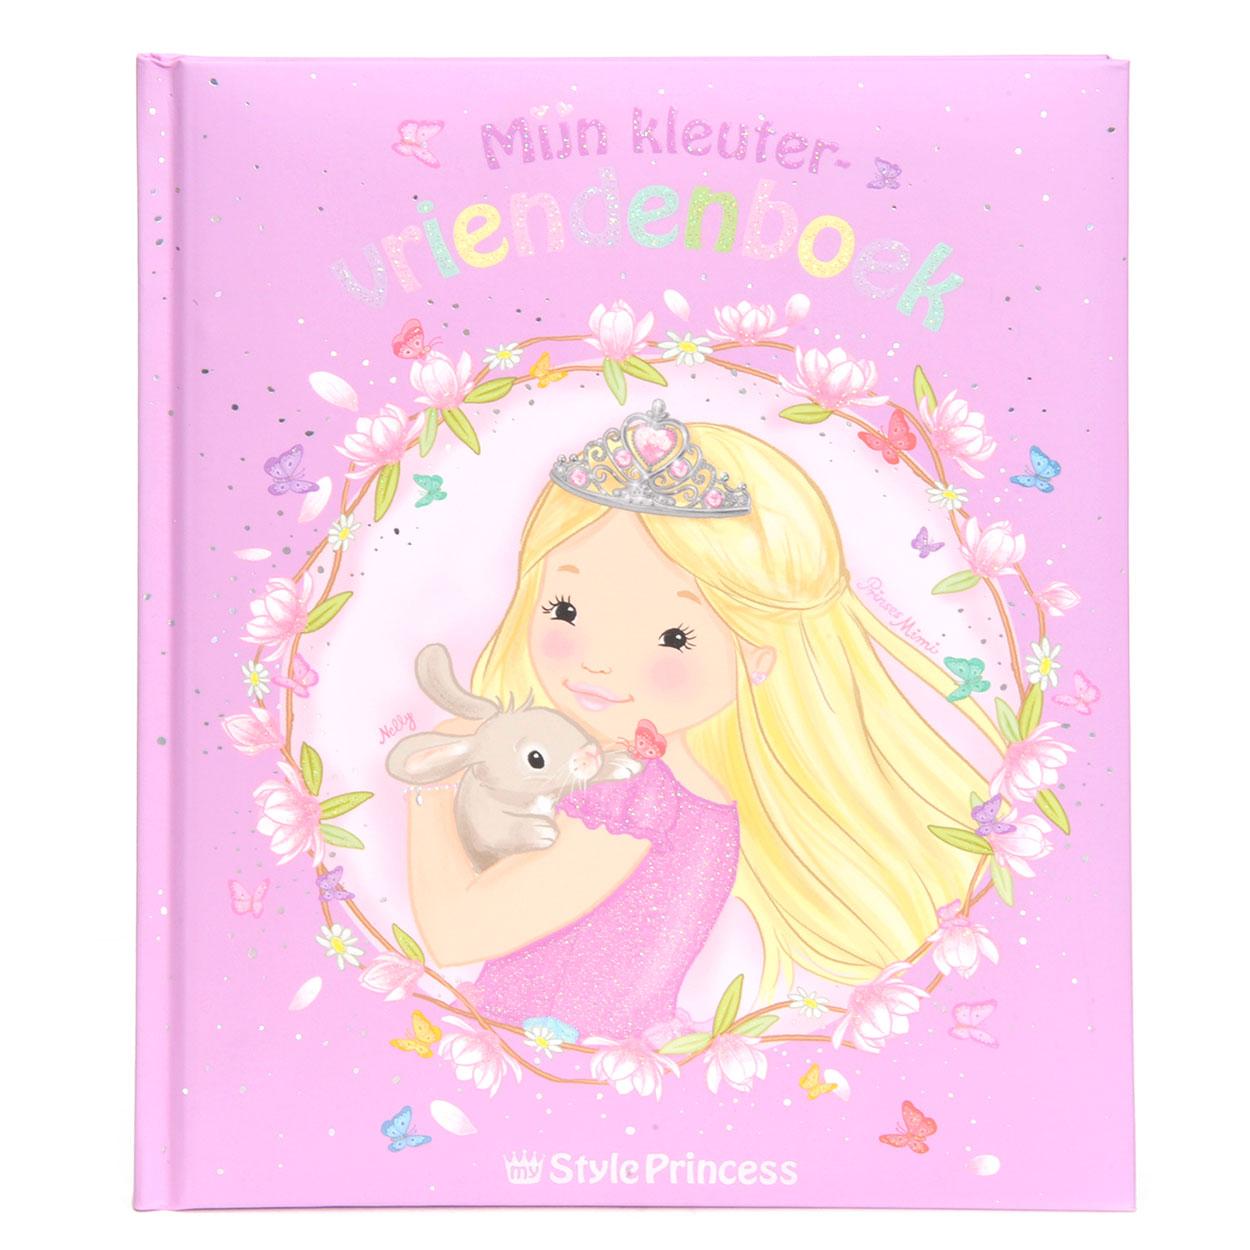 My Style Princess Vriendenboek Prinses Mimi Amp Nelly